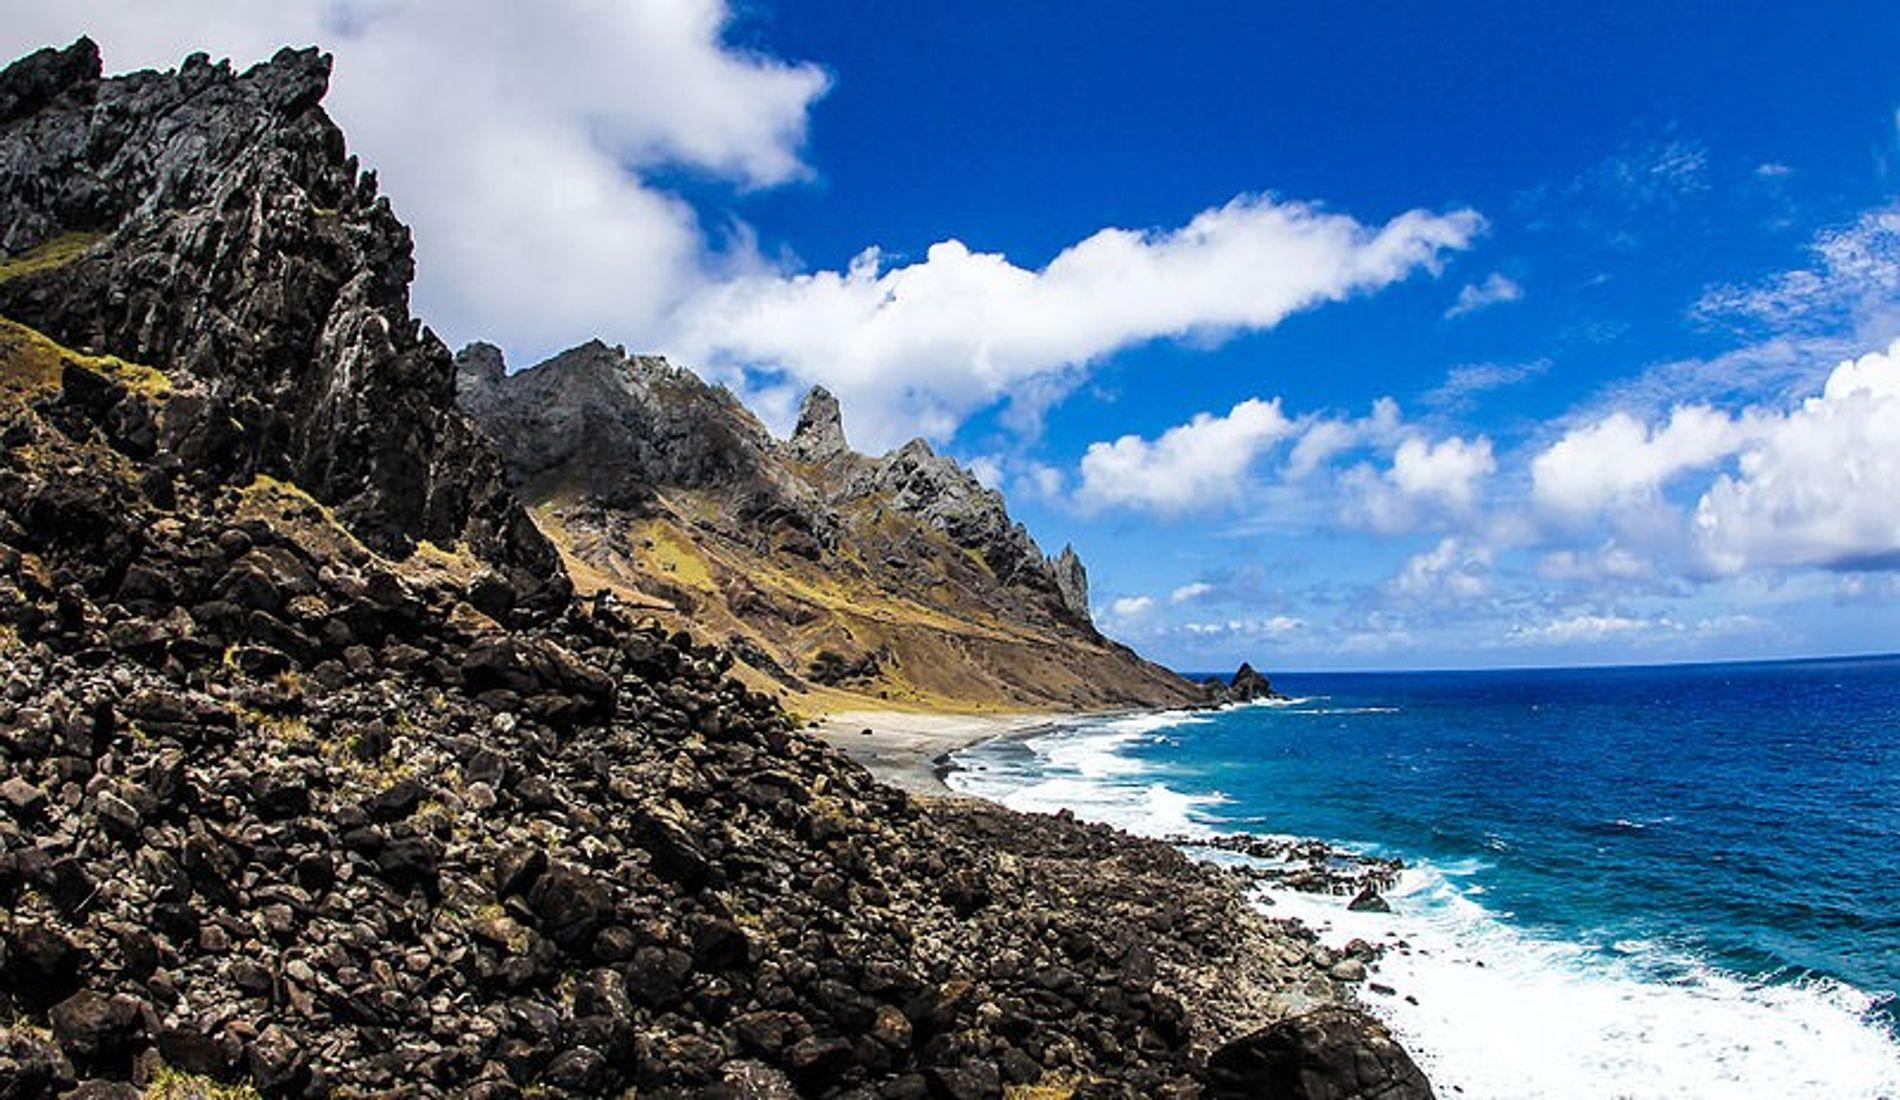 L'île de Trindade